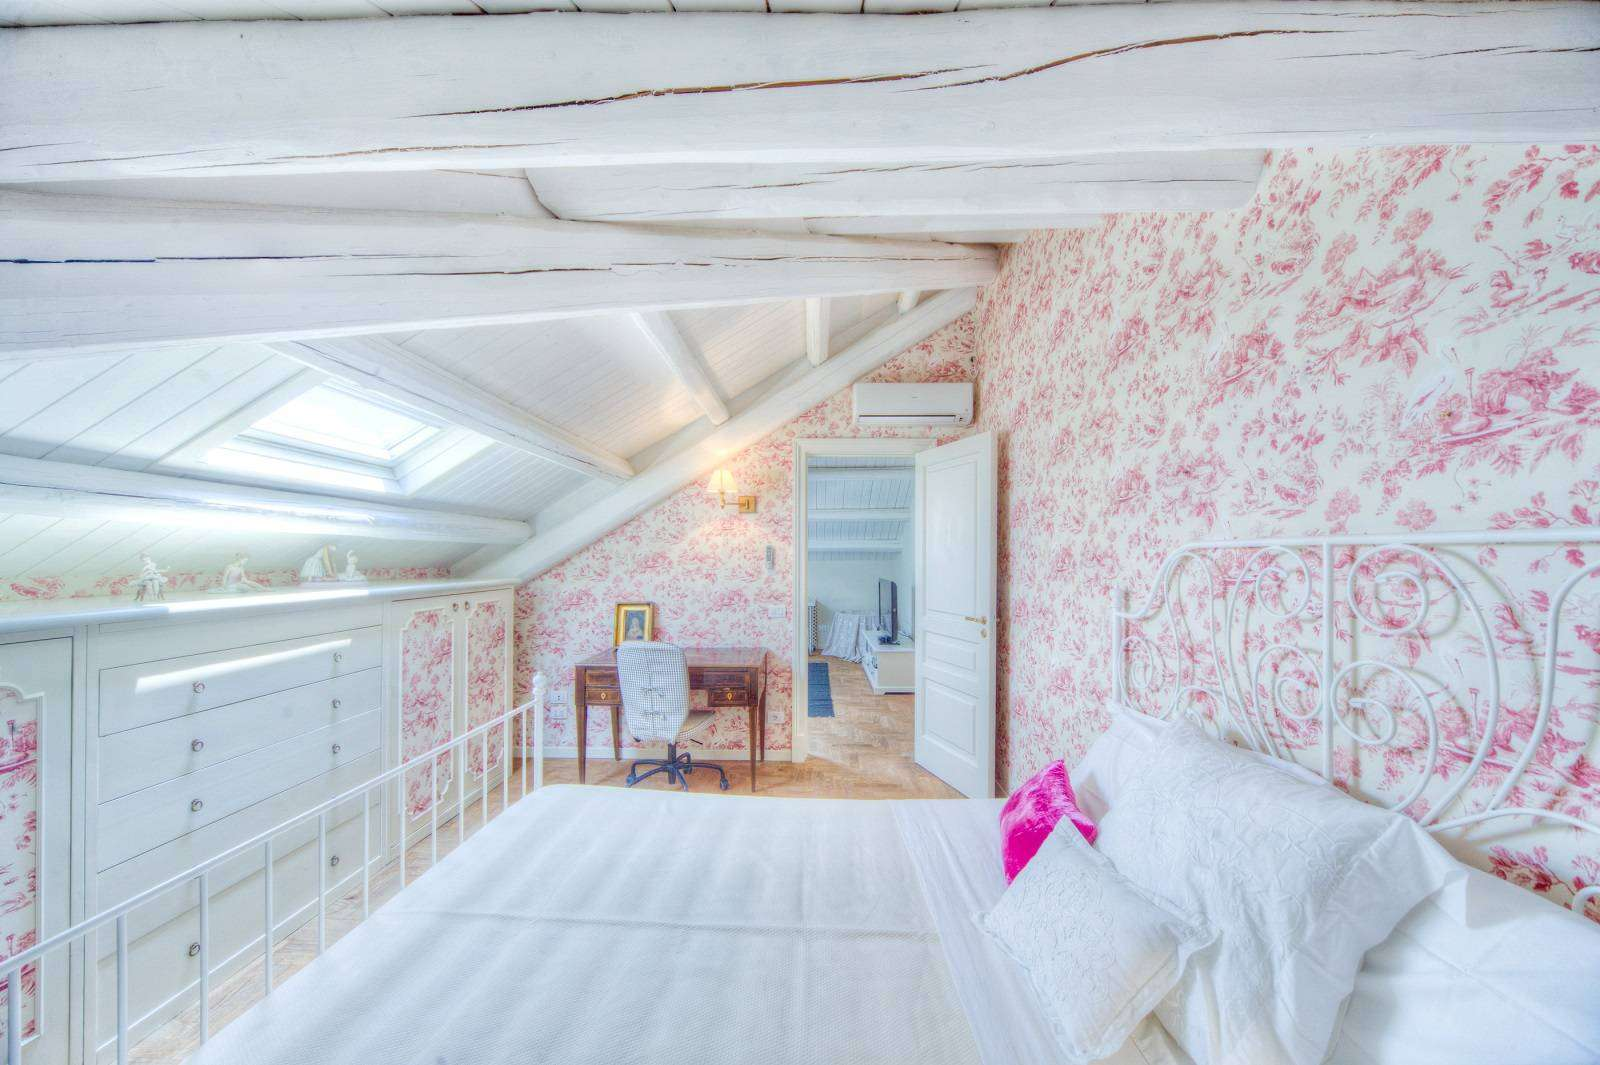 12 Rose Double bedroom